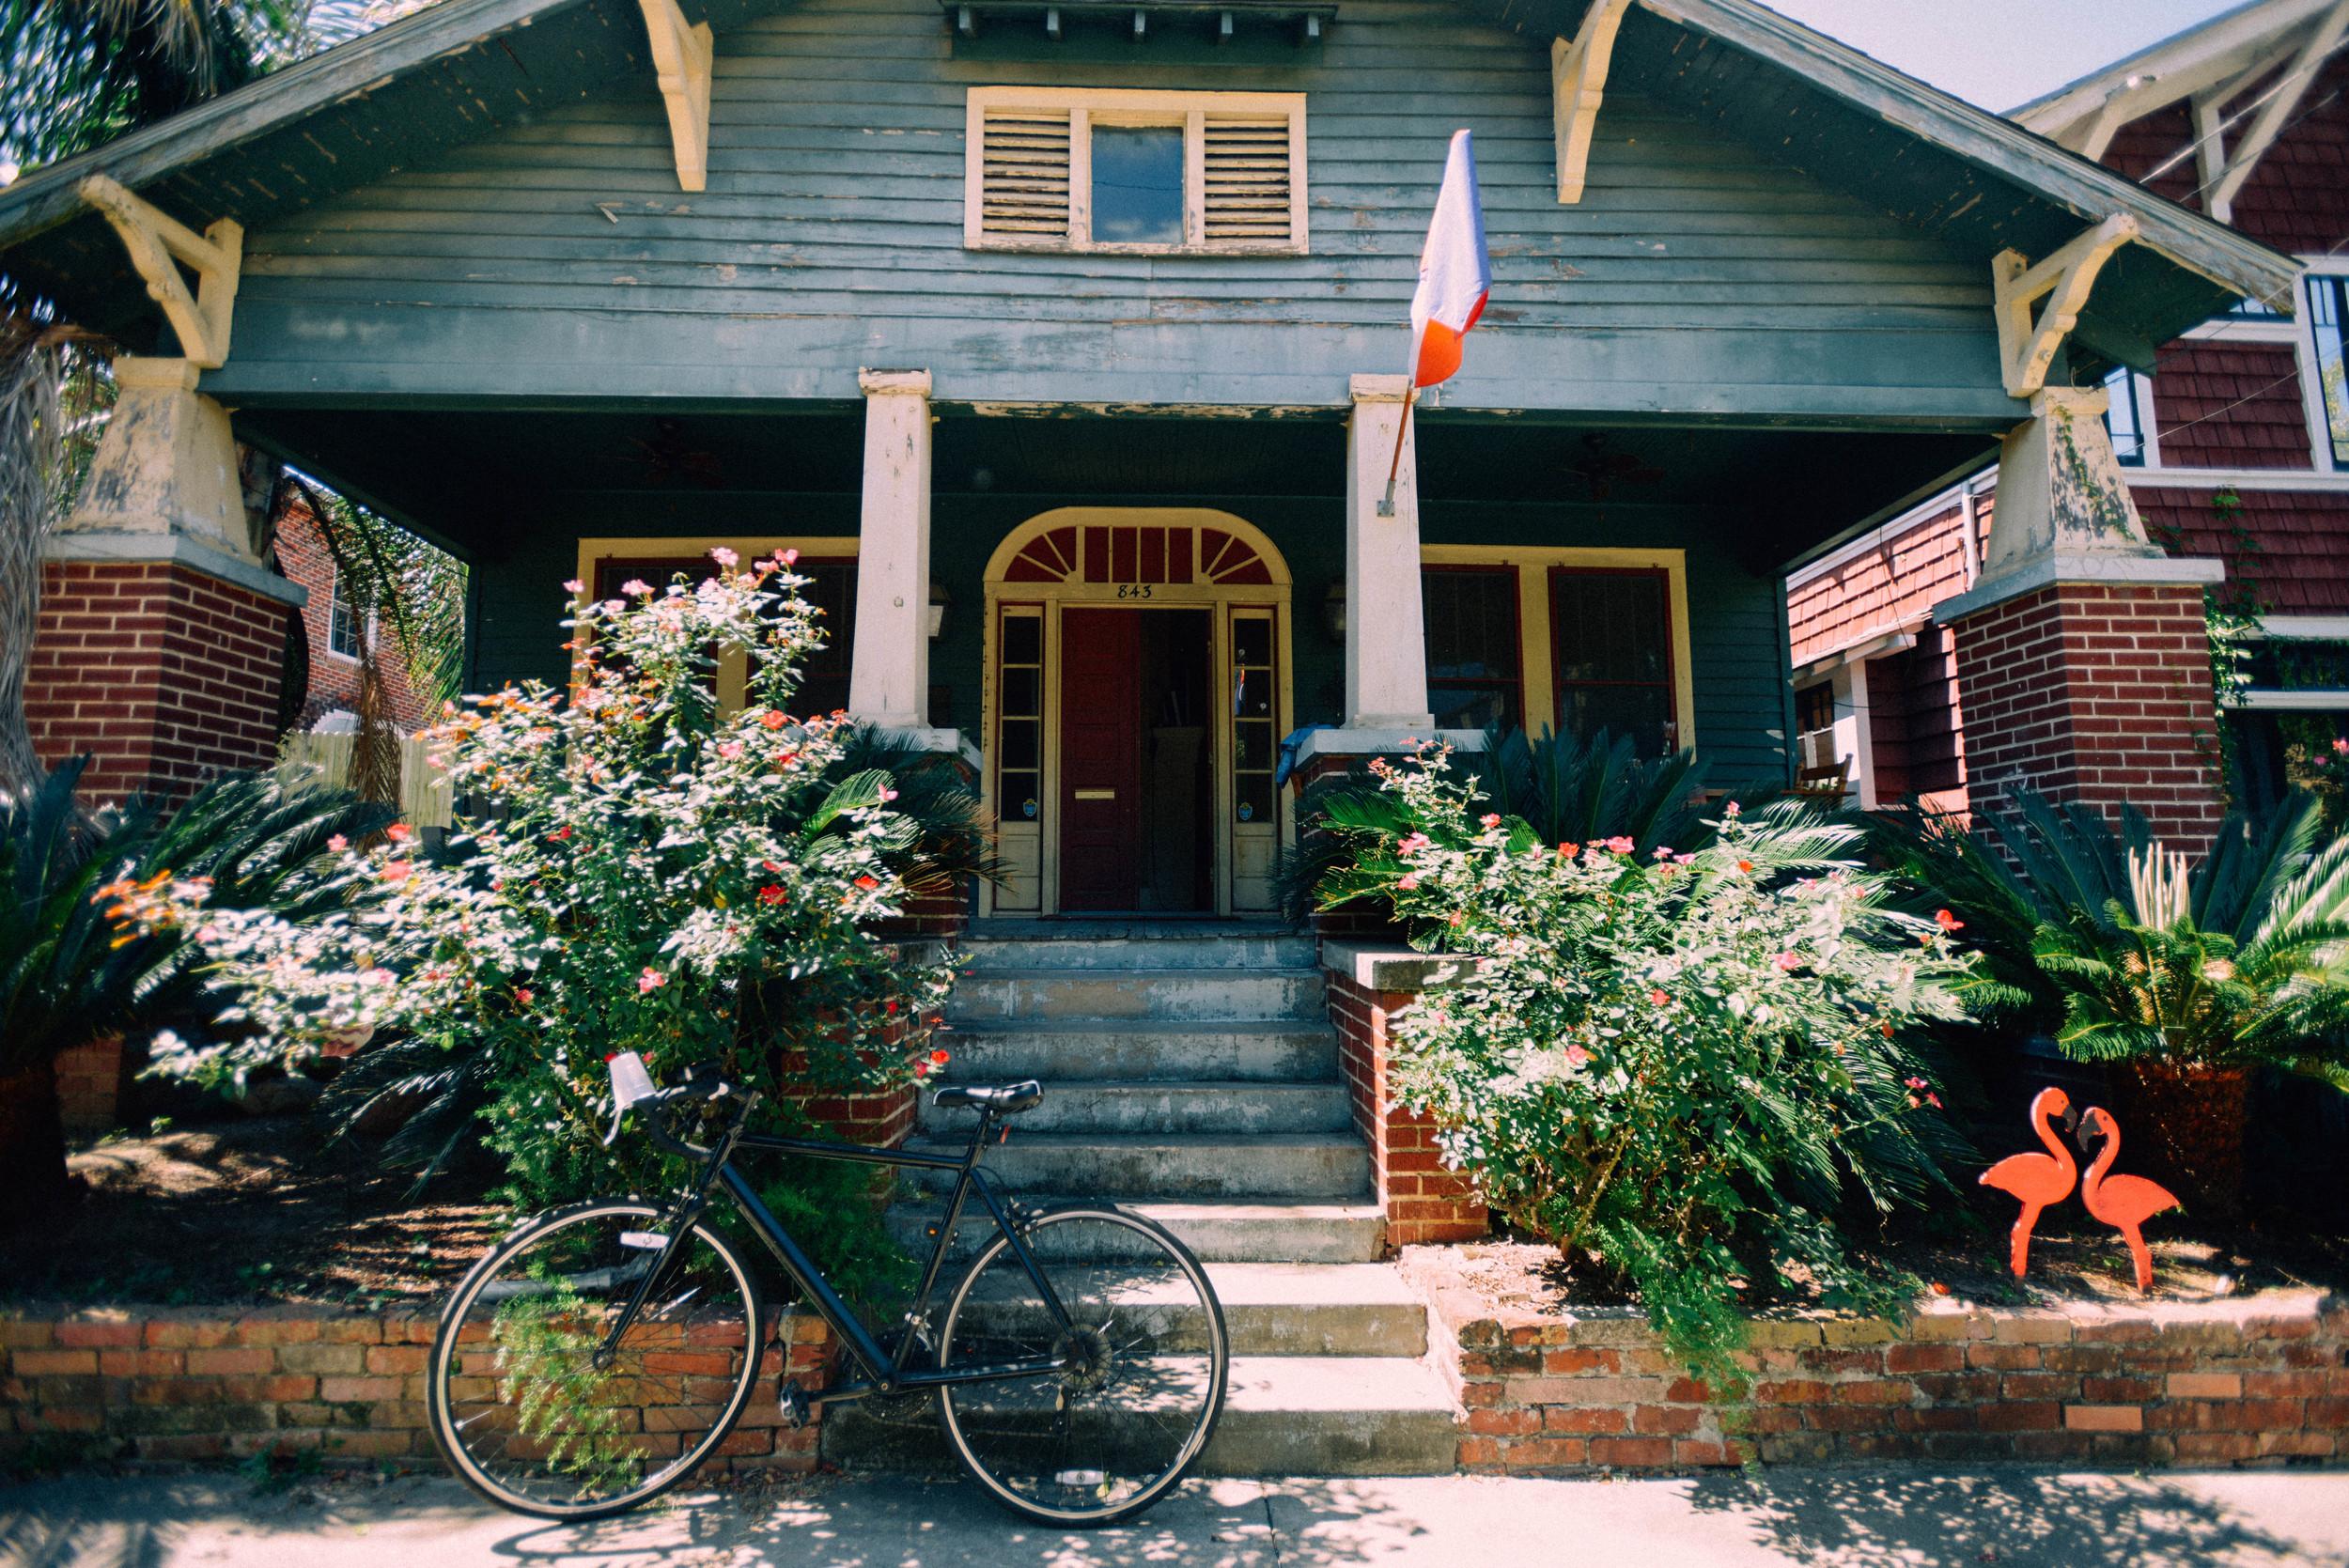 Maya's house.